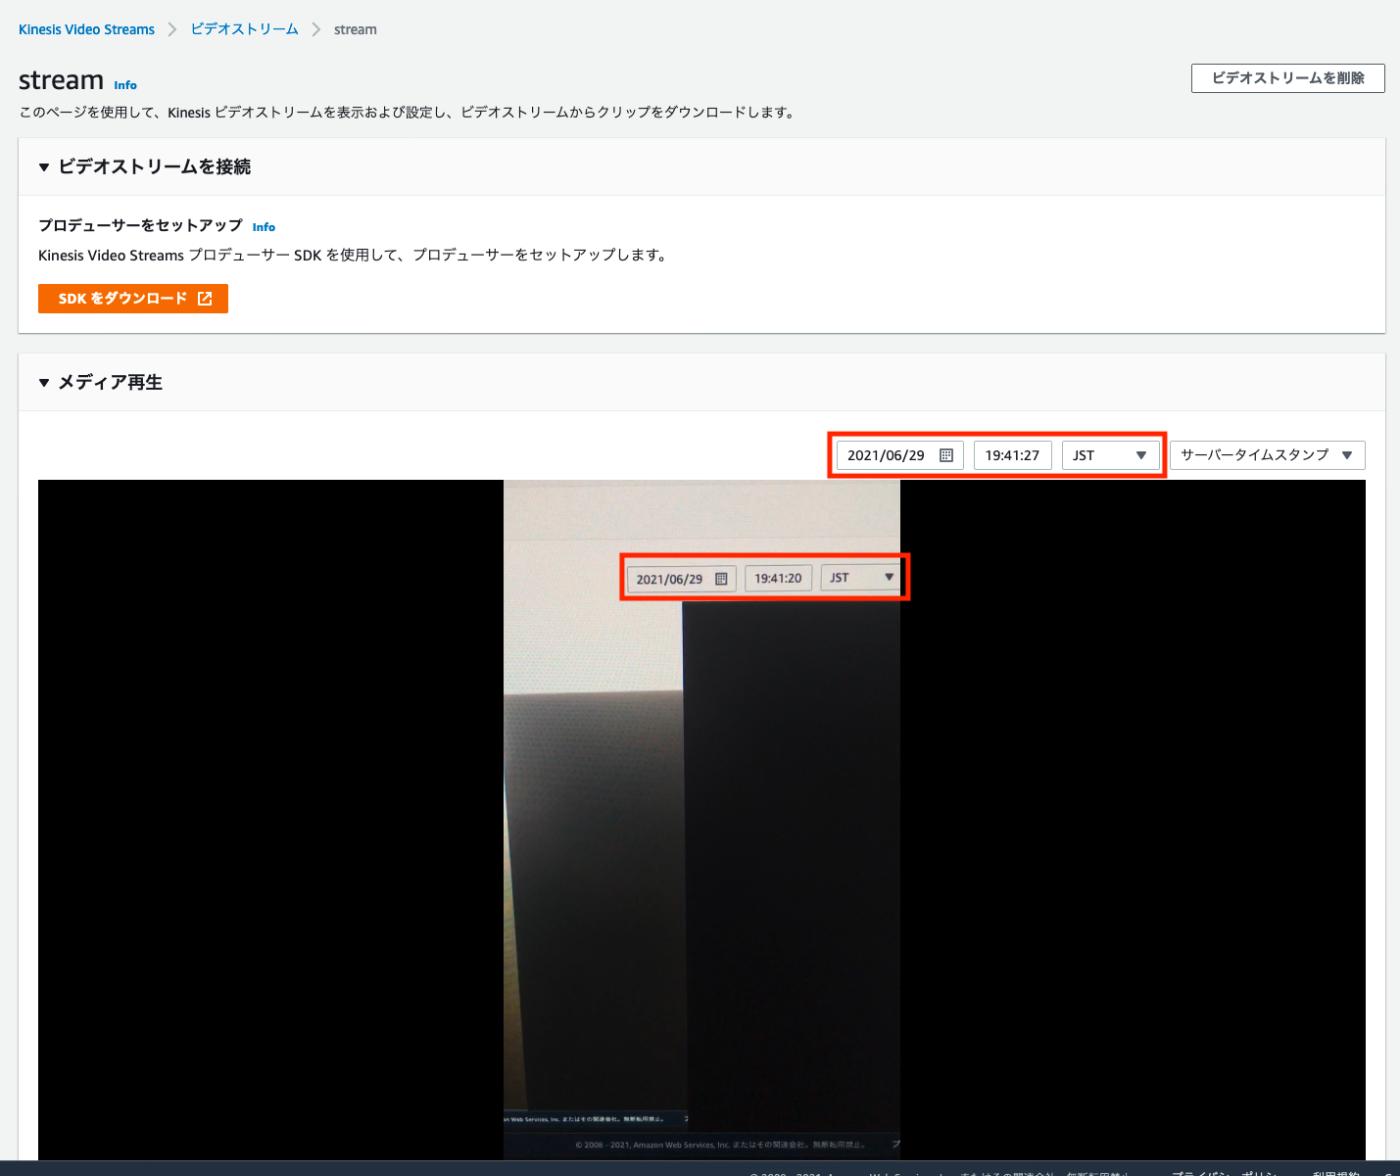 Kinesis Video Streams ストリーム詳細 - メディア再生